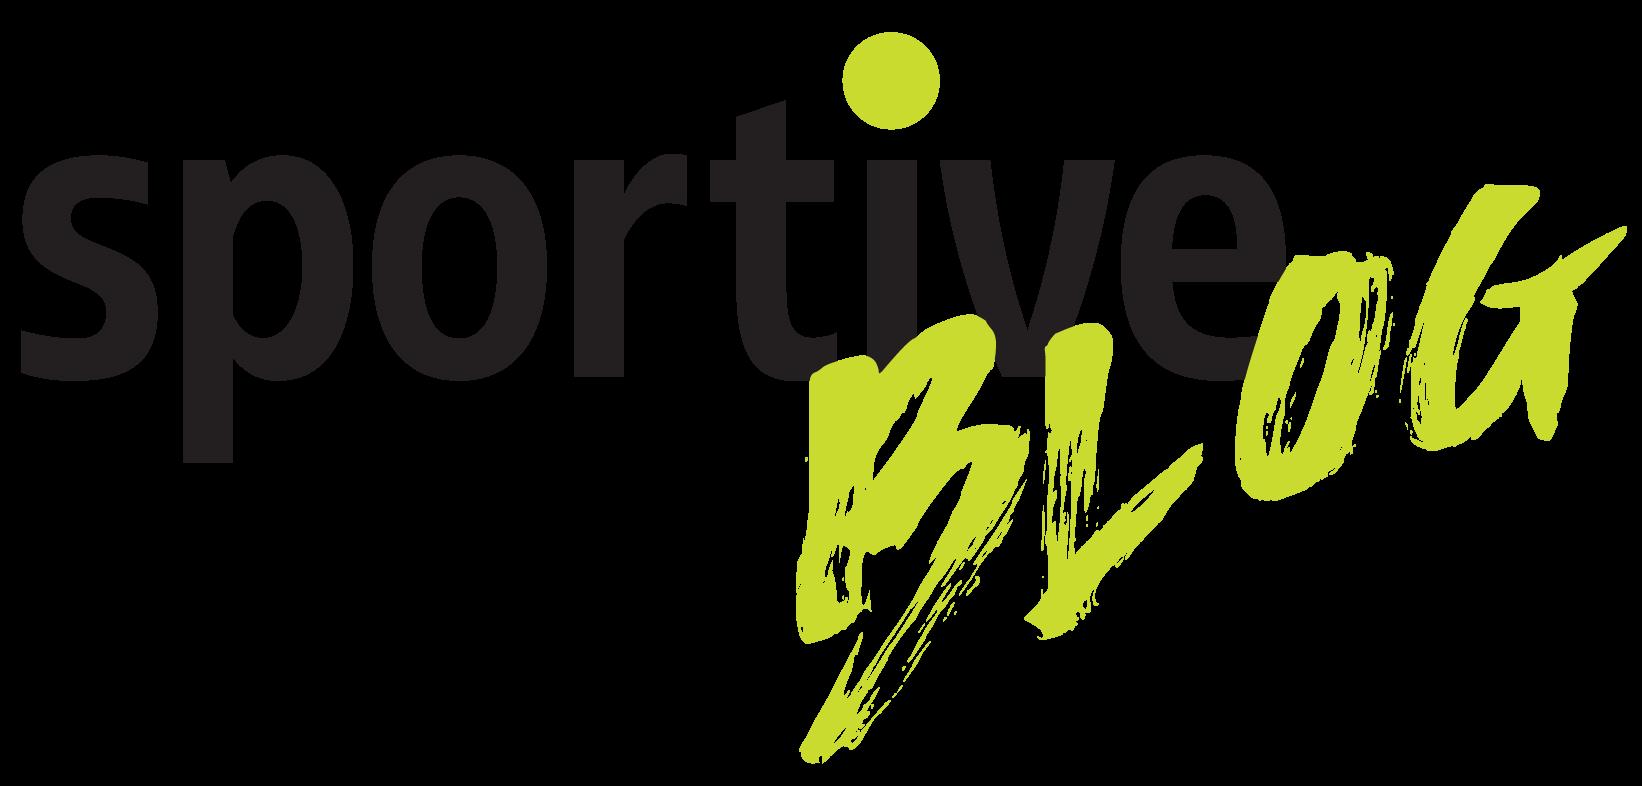 Sportive Blog